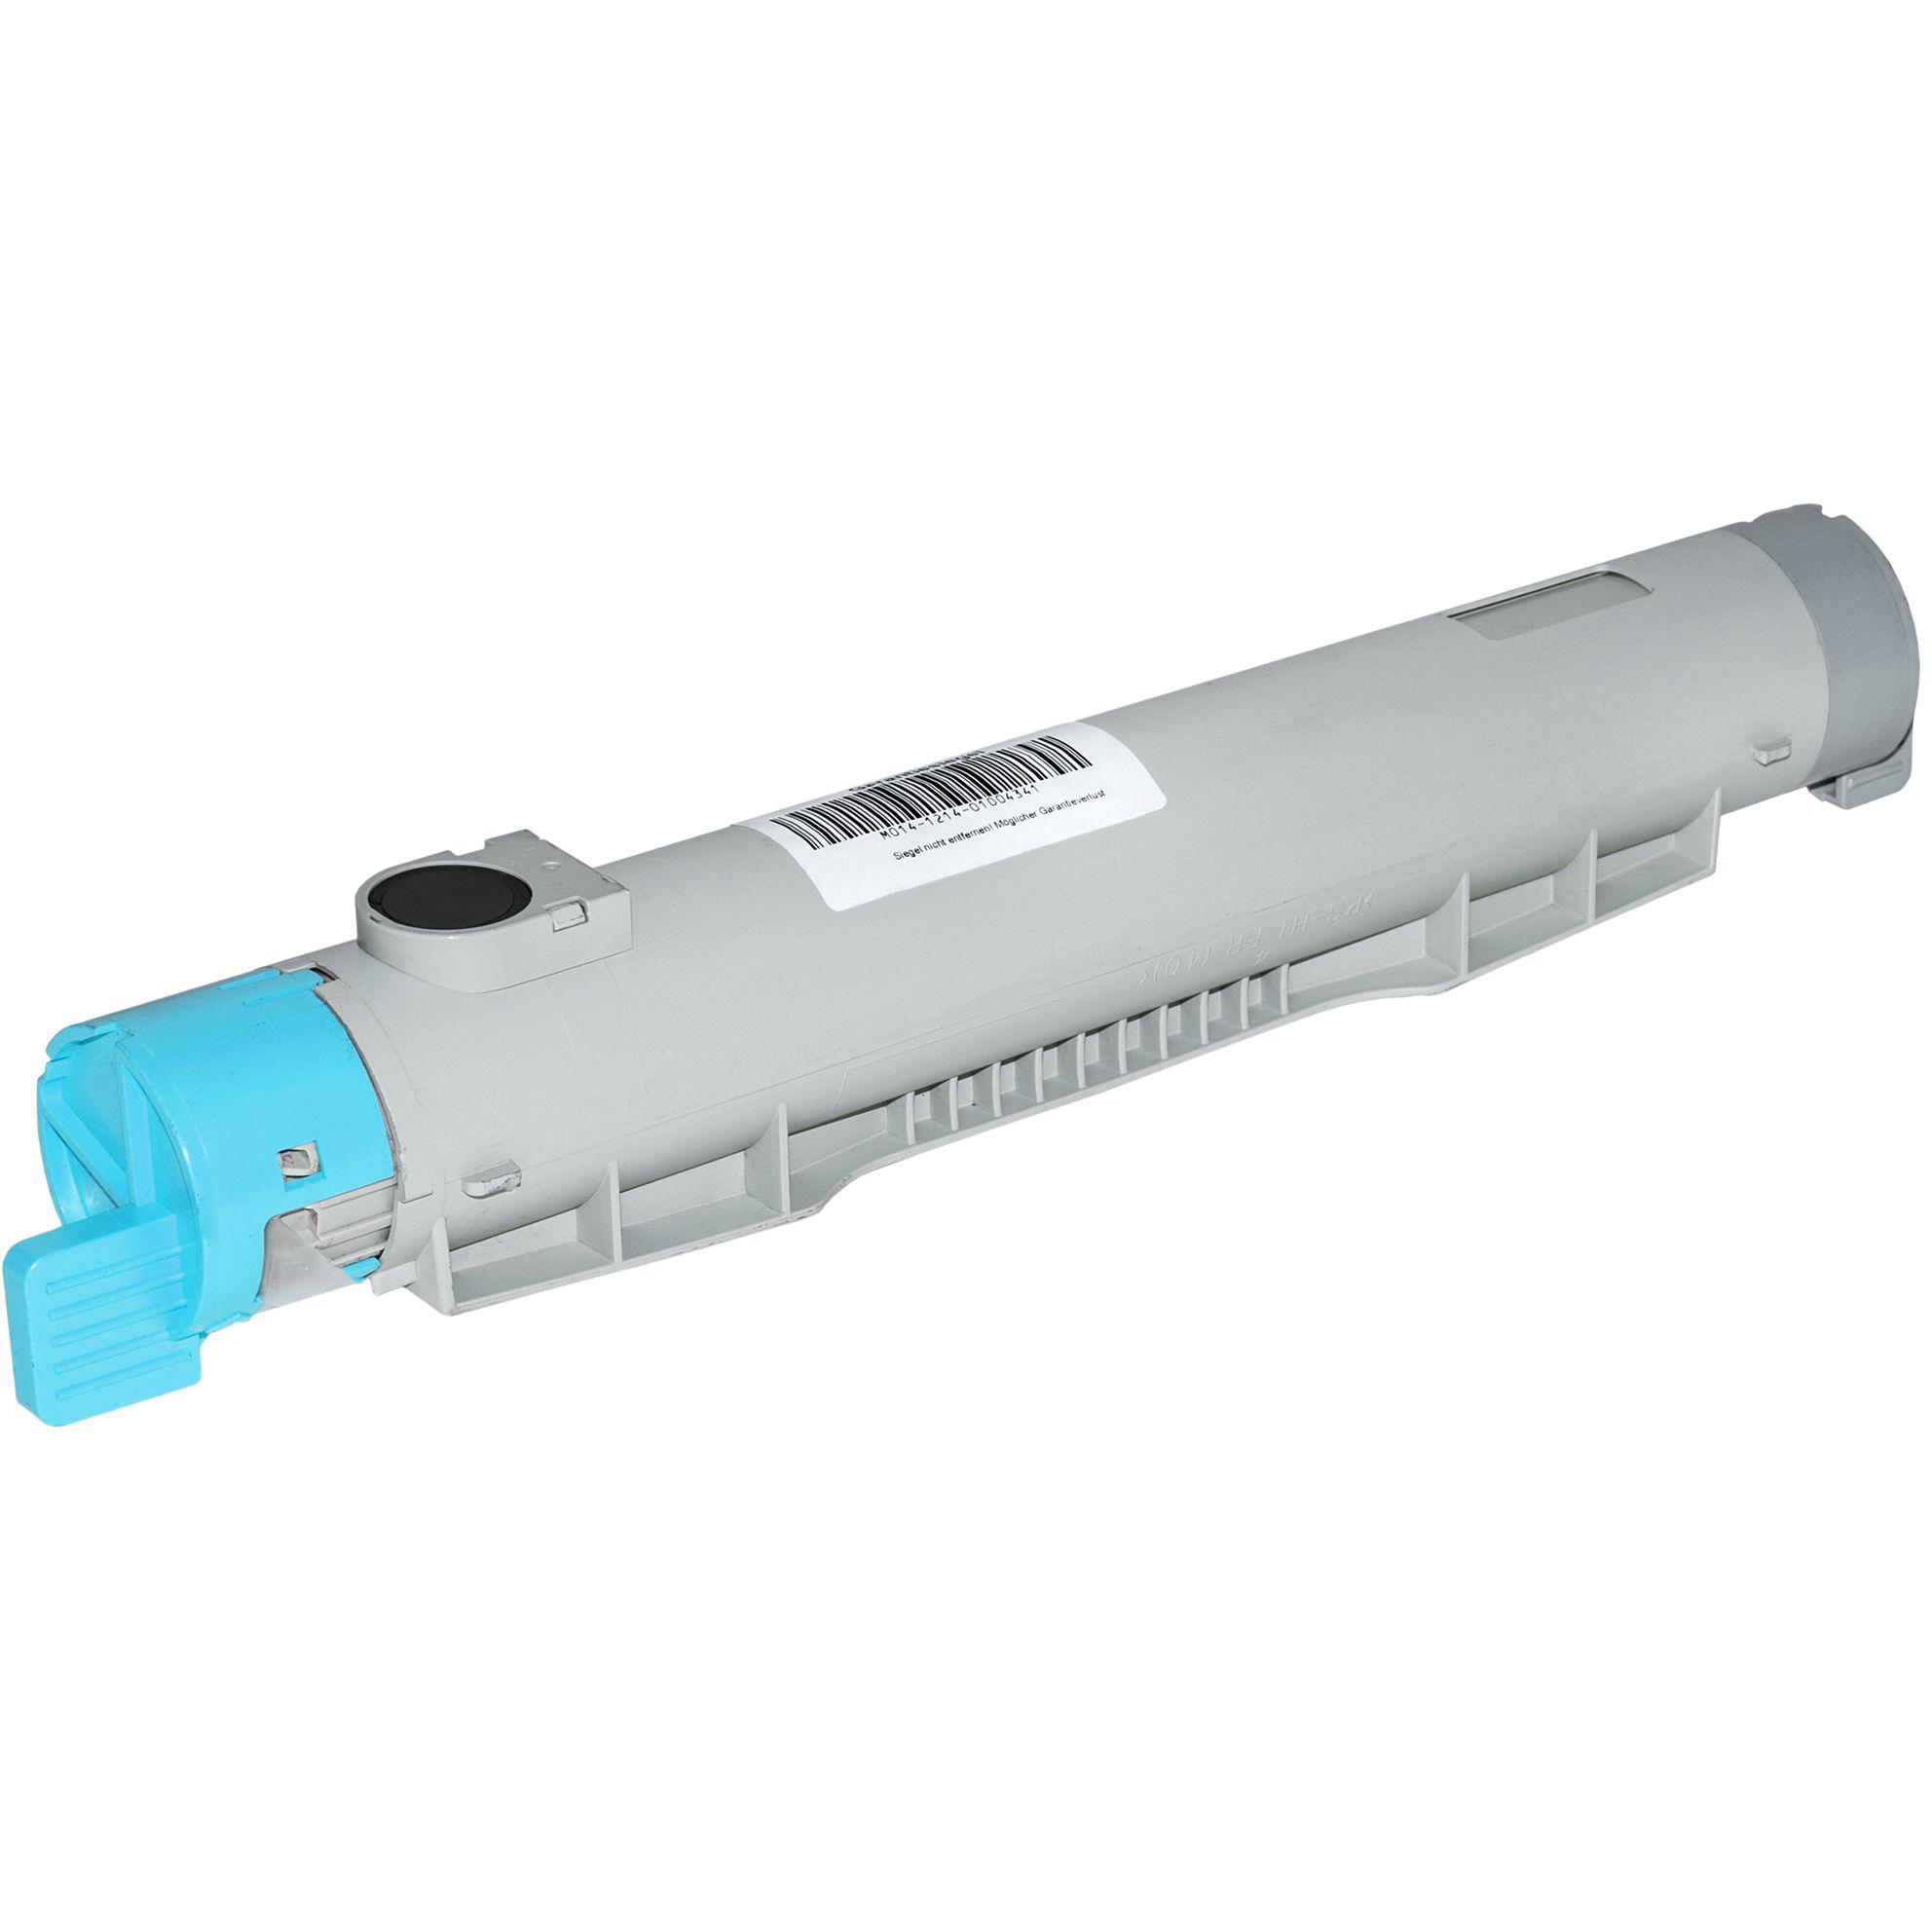 Original Konica Minolta 1710550-004 Cyan Toner Cartridge (9960A1710550004)